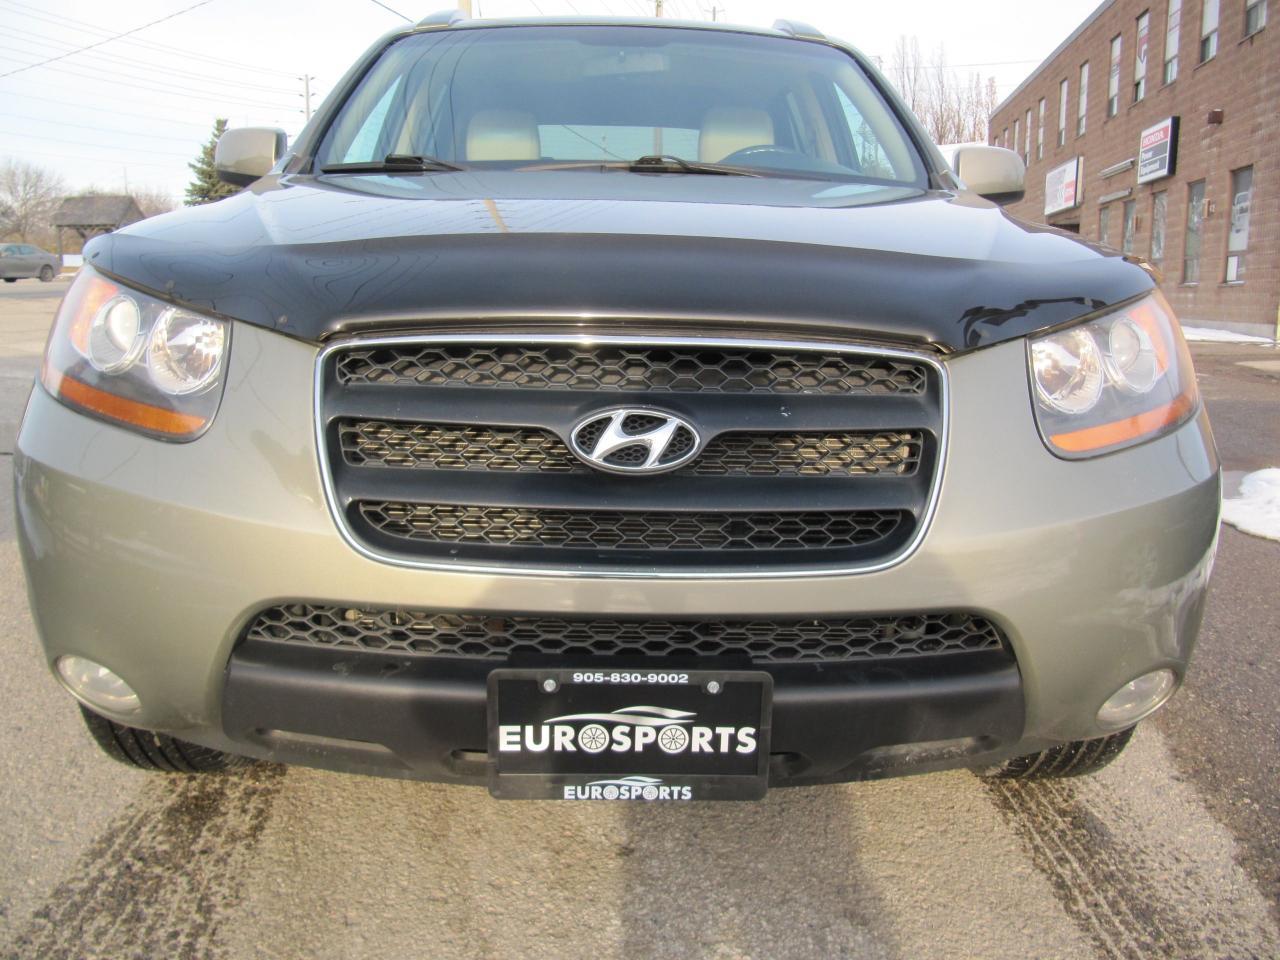 2008 Hyundai Santa Fe GLS Limited LEATHER & SUNROOF